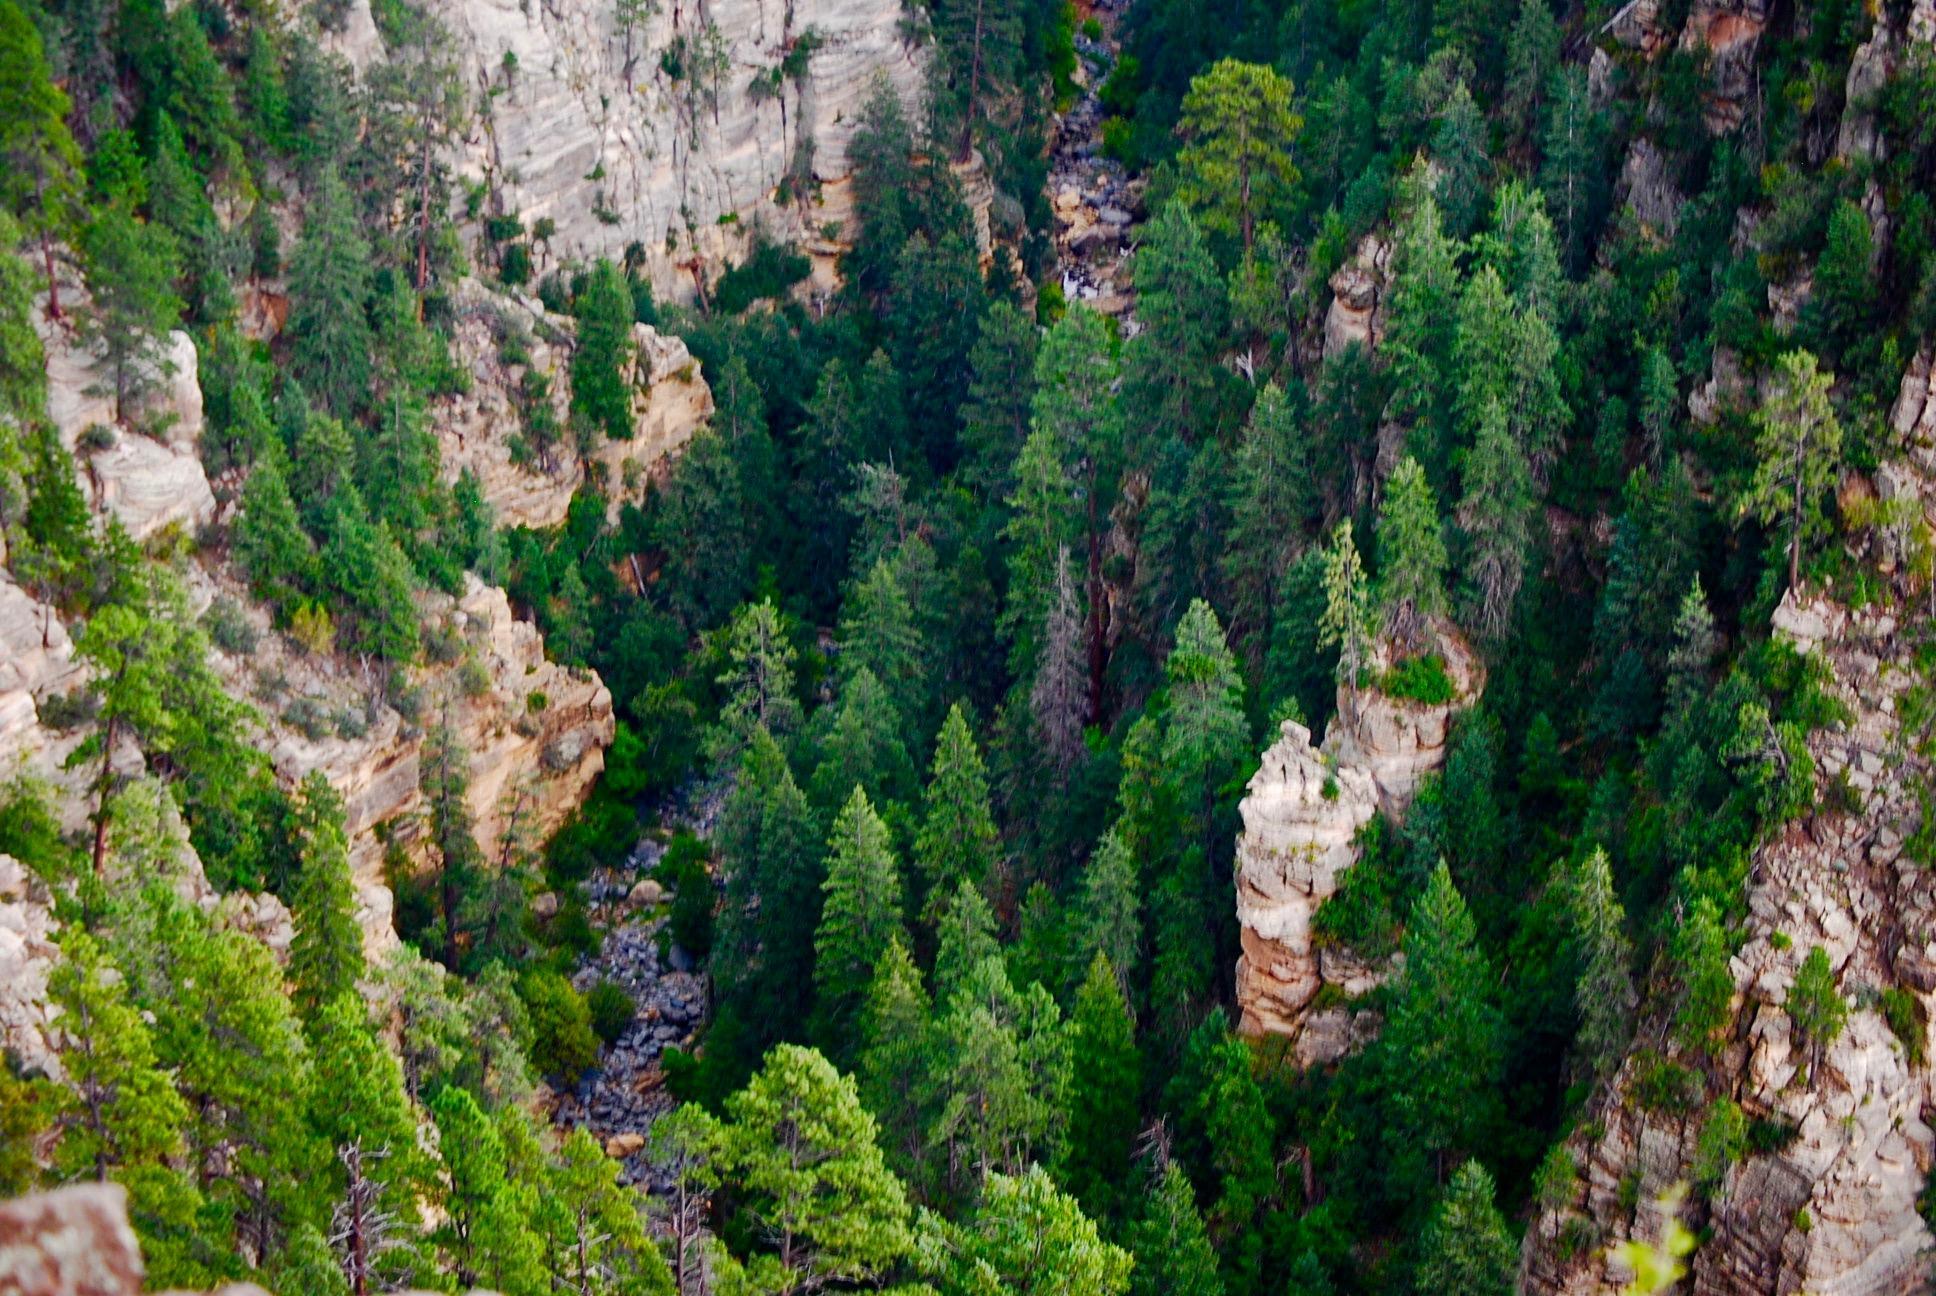 Pine trees in an Arizona canyon